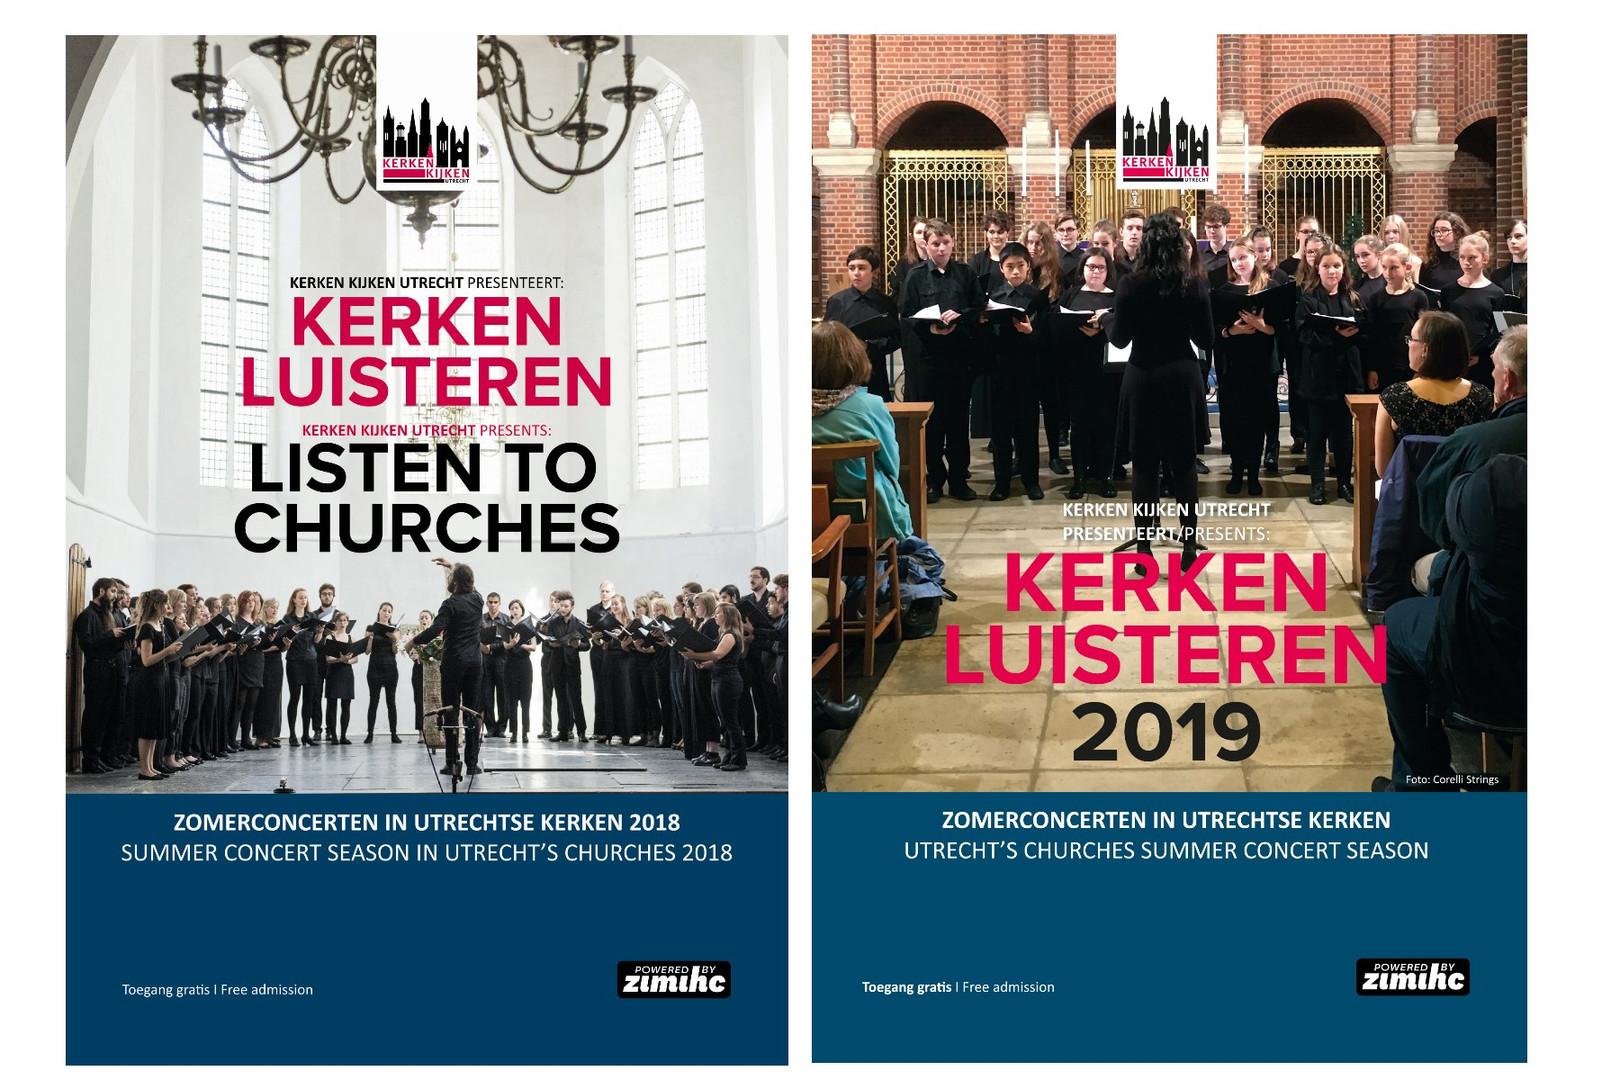 Kerken Luisteren